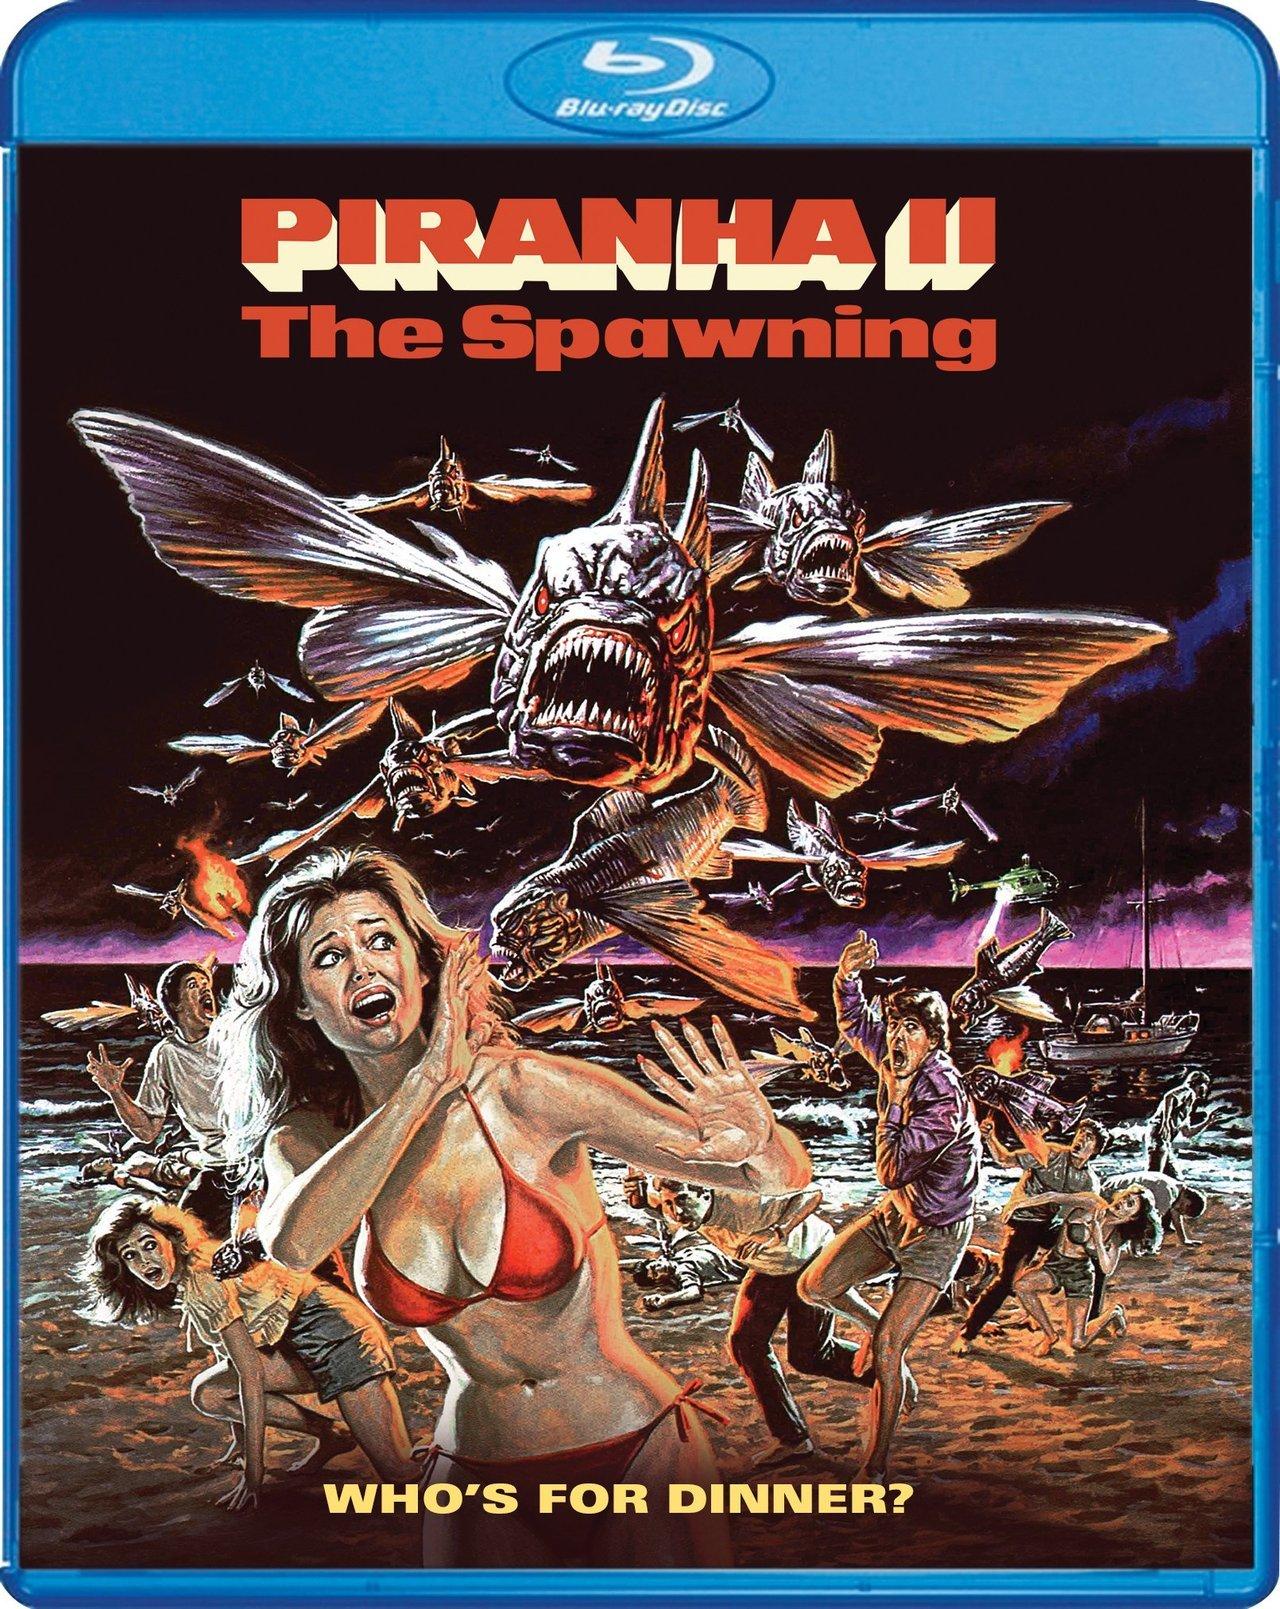 piranha II blu-ray